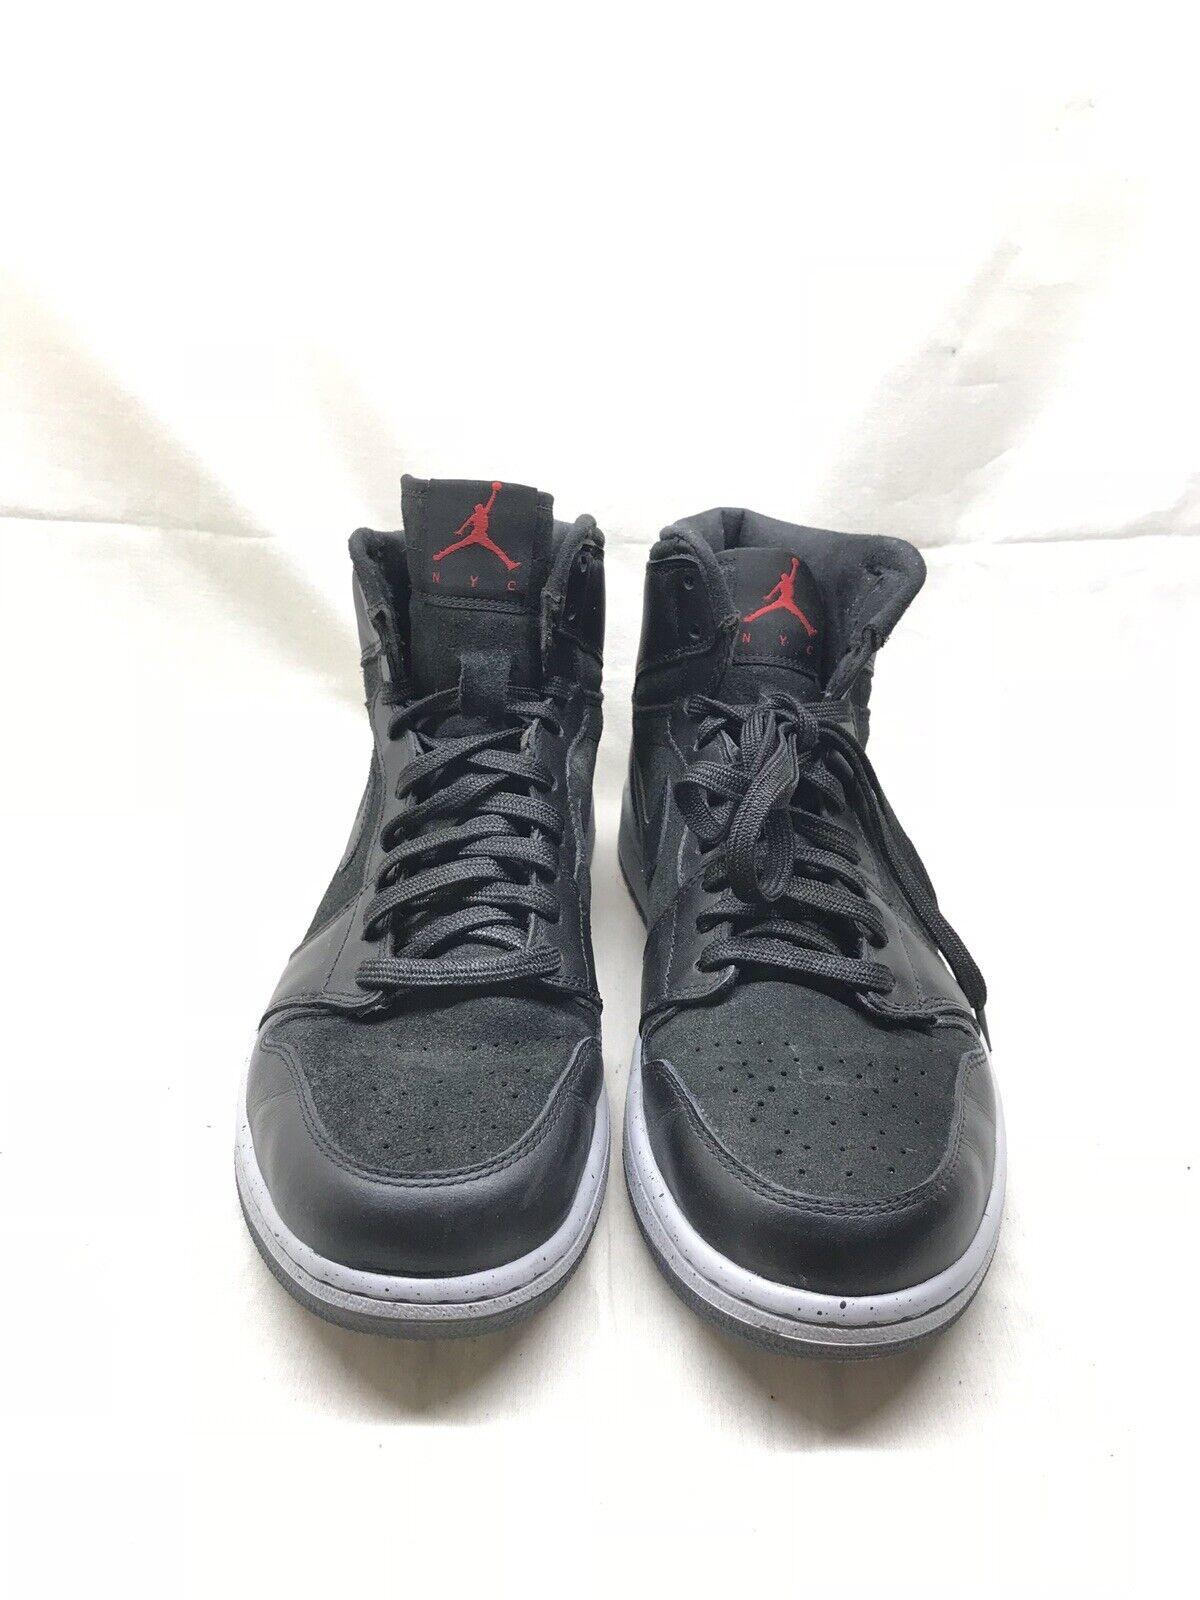 d8c7314554 Nike Air Jordan 1 Retro High NYC 23NY Black Red Wold Grey Size 11 Lightly  Worn